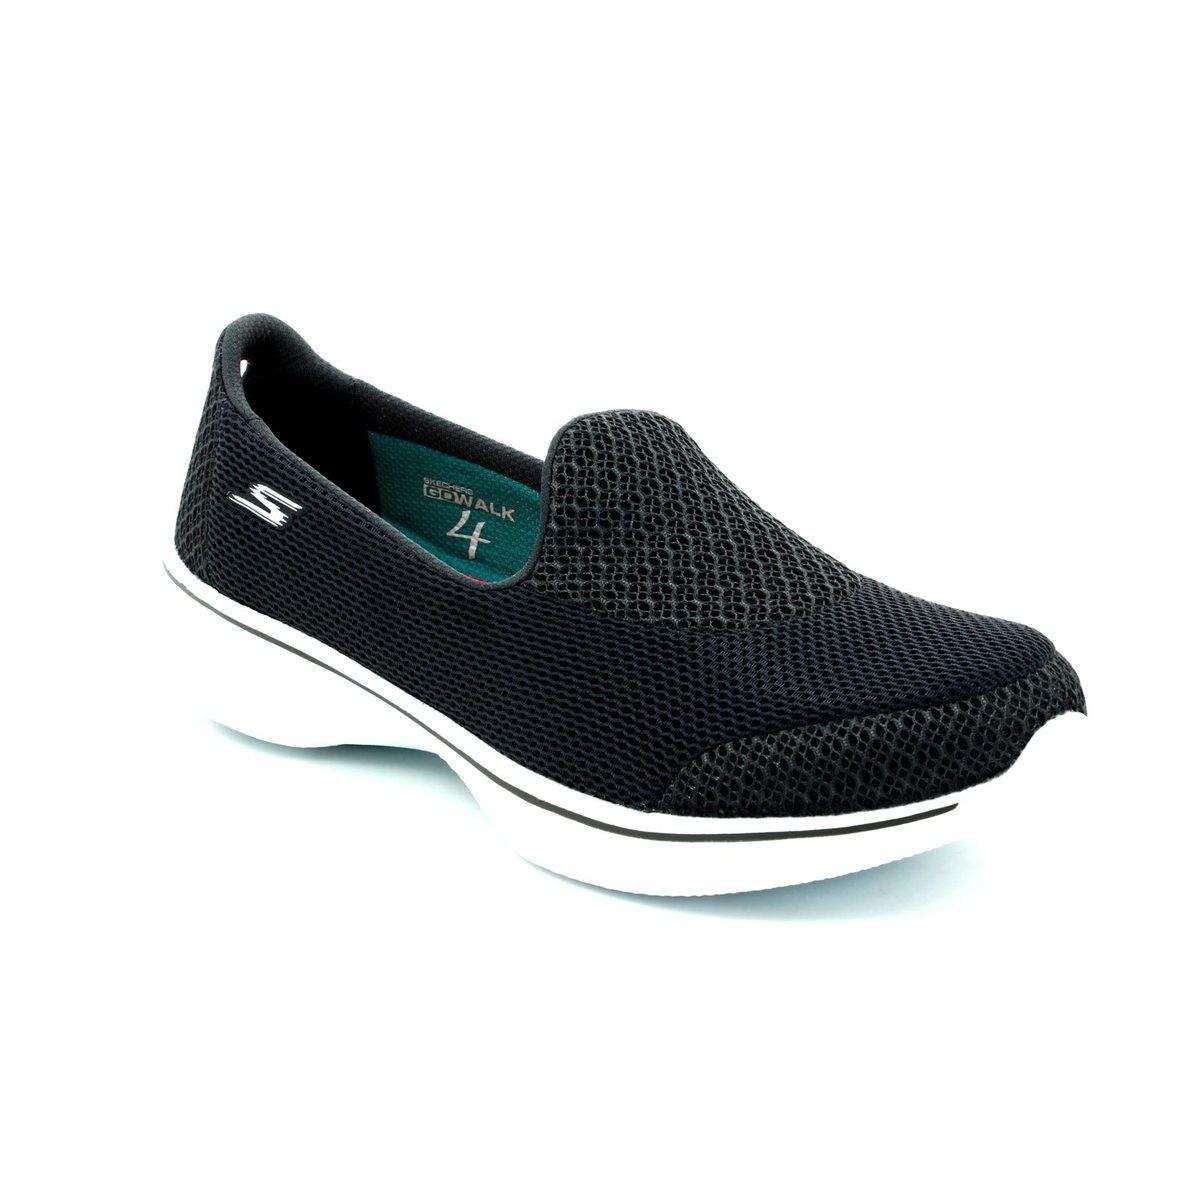 9e716c63801 Skechers Go Walk 4 14170 CHAR Charcoal trainers